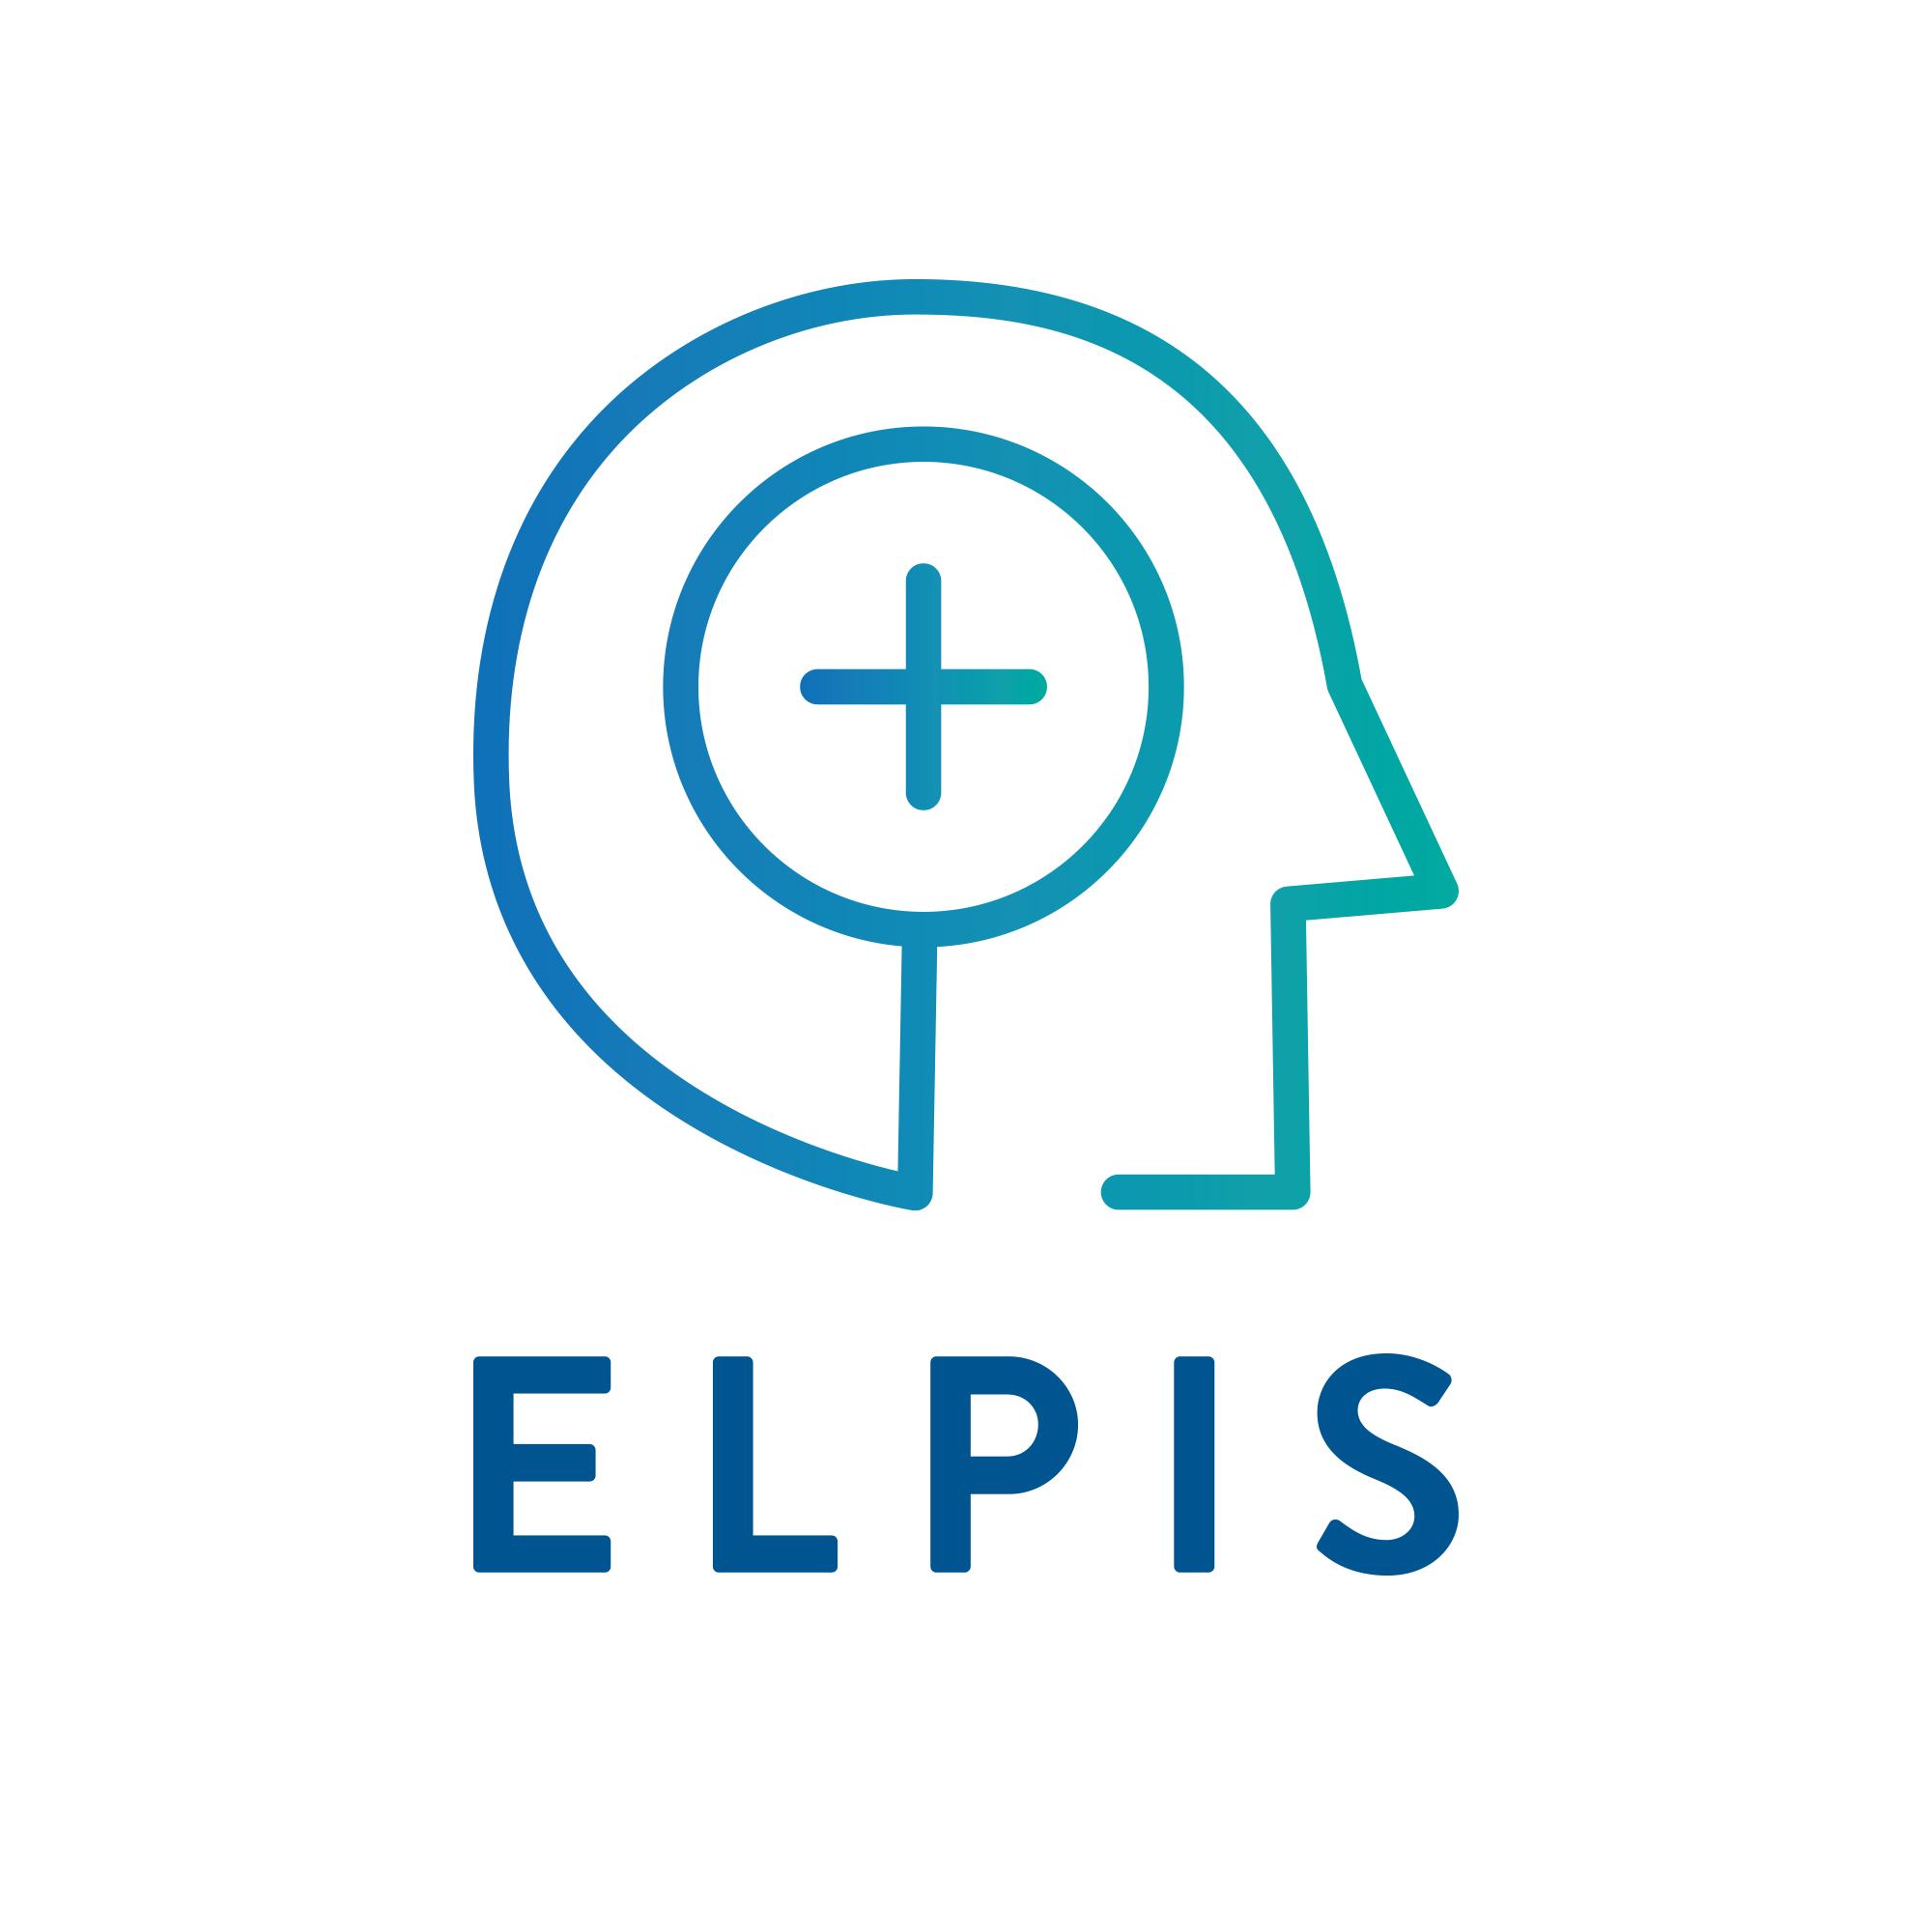 Logo design for Elpis